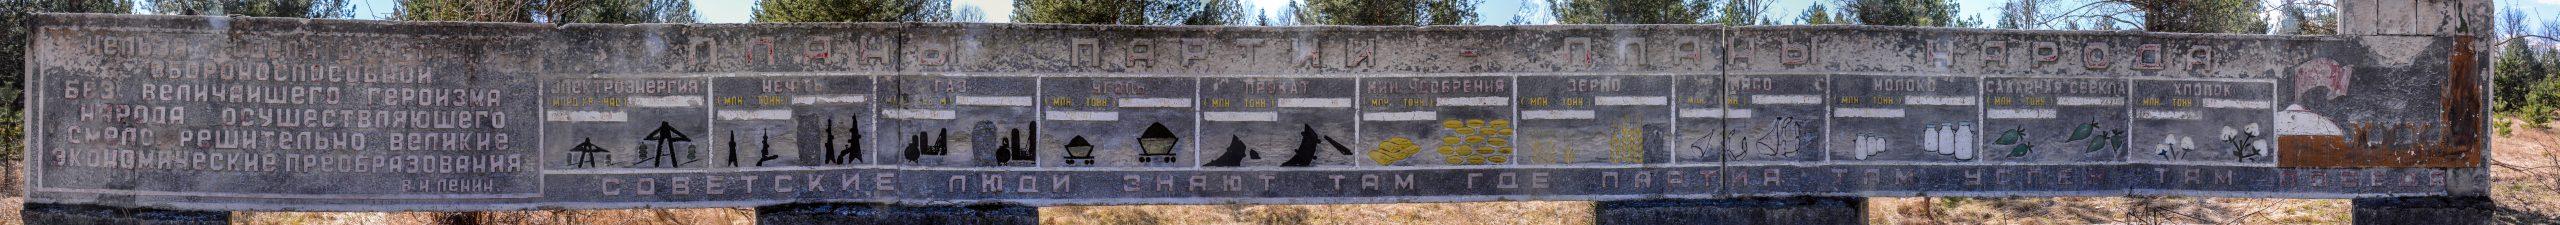 industrial production soviet mural panorama soviet war memorial sowjetisches ehrenmal fuerstenberg droegen brandenburg deutschland lost places urbex abandoned